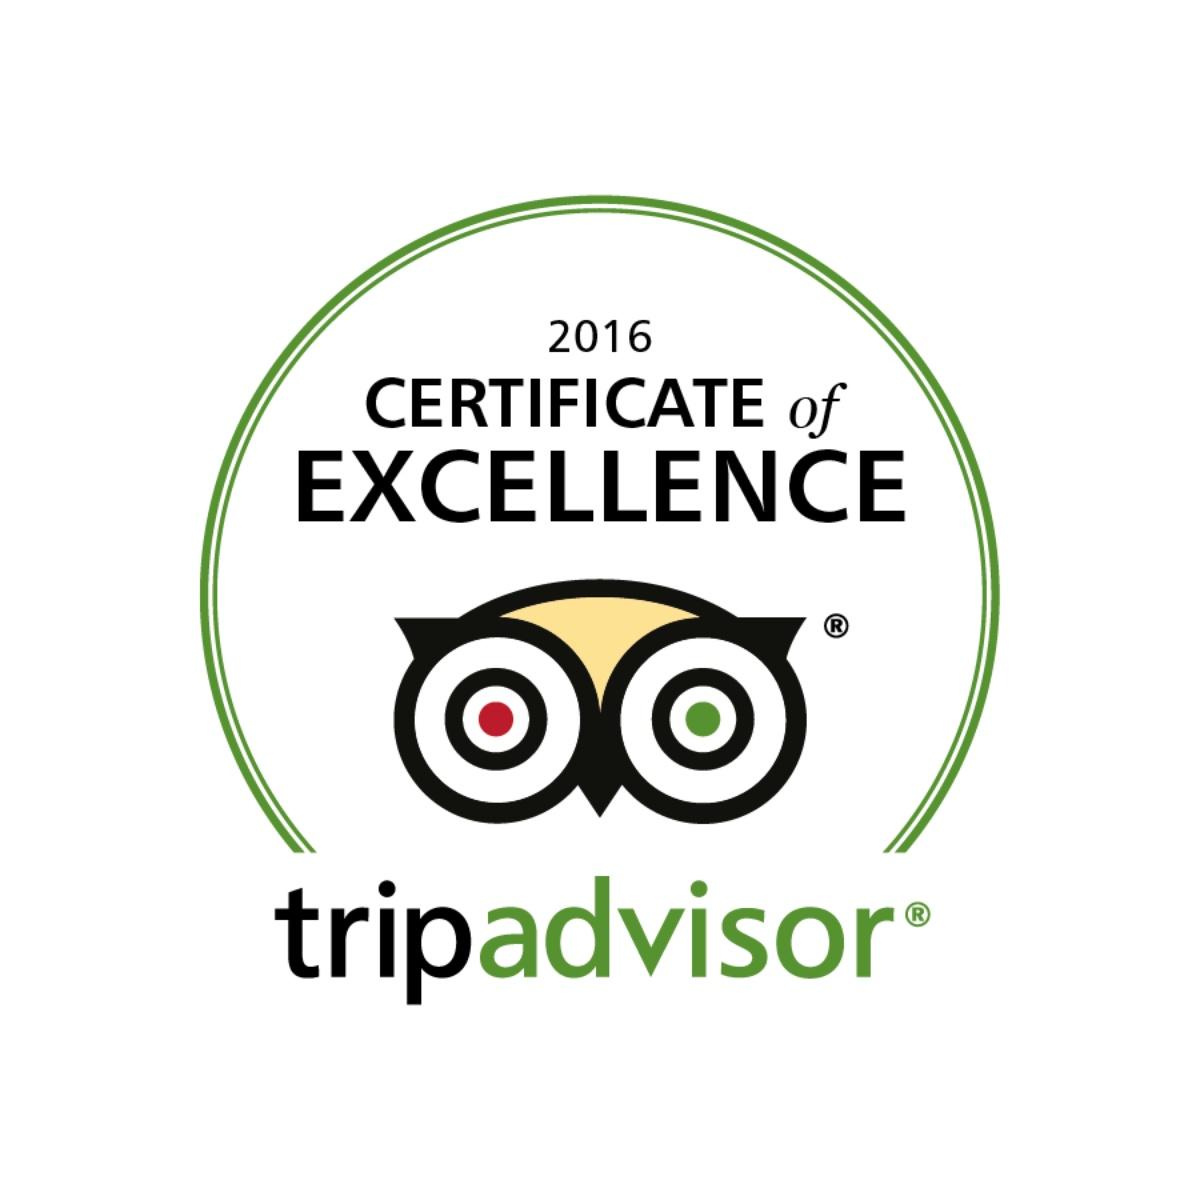 Tripadvisor Certificate Of Excellence 2016